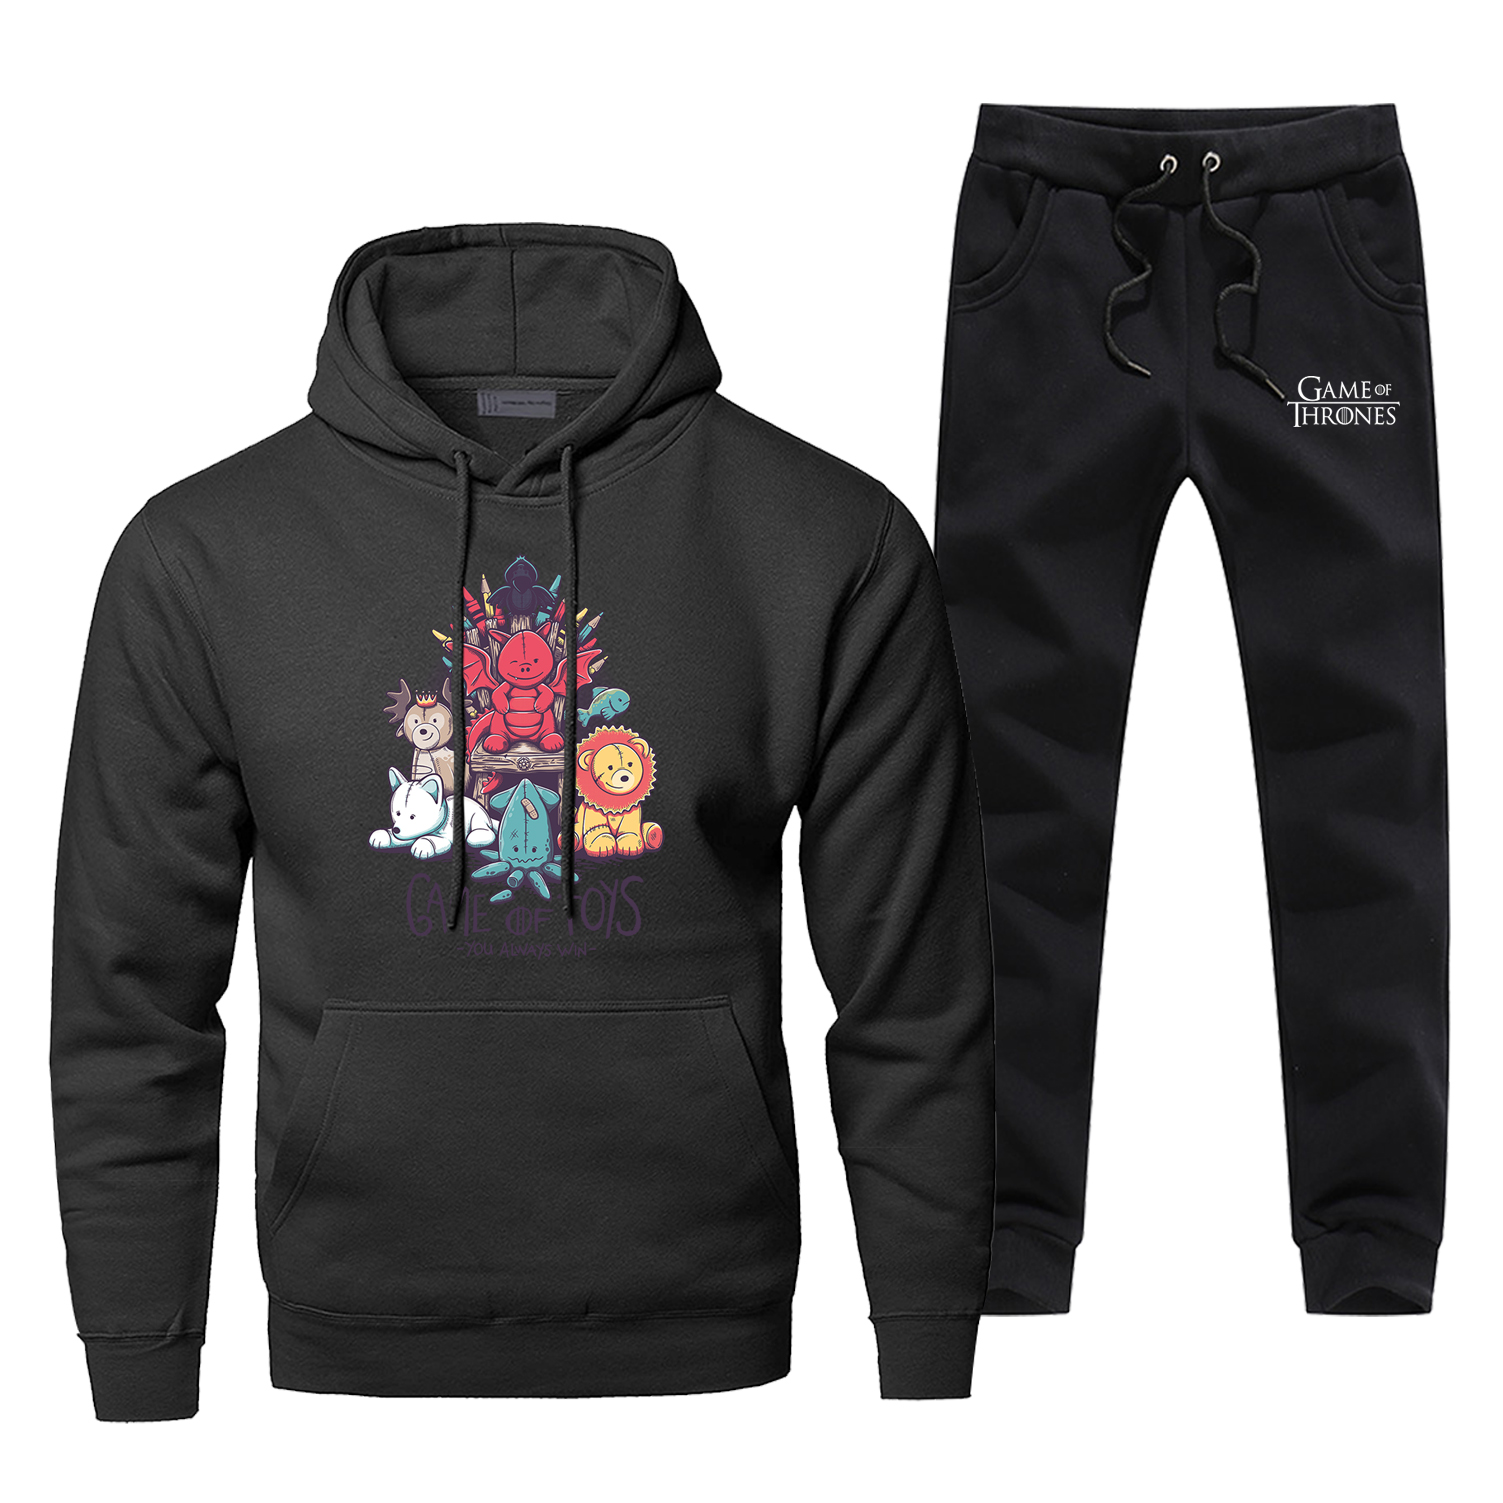 Funny Game Of Thrones Toys Hoodies+pants 2Piece Sets Fashion Cartoon Creative Design Sweatshirt Men Fleece Sportswear Sweatpants